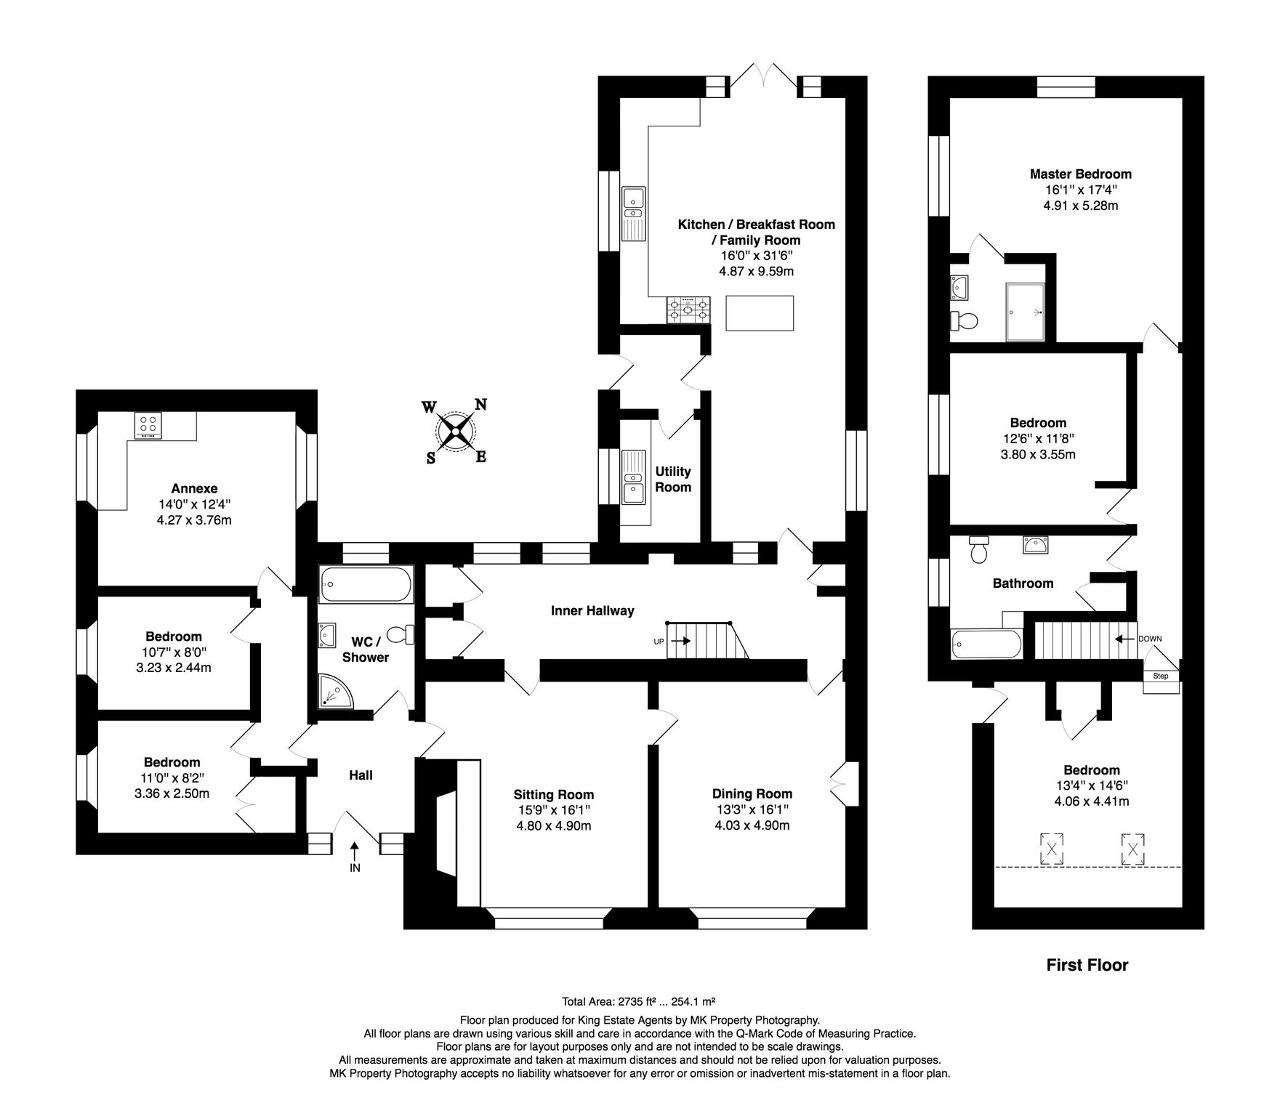 Floorplan for Main Street, Cosgrove, MK19 7JL